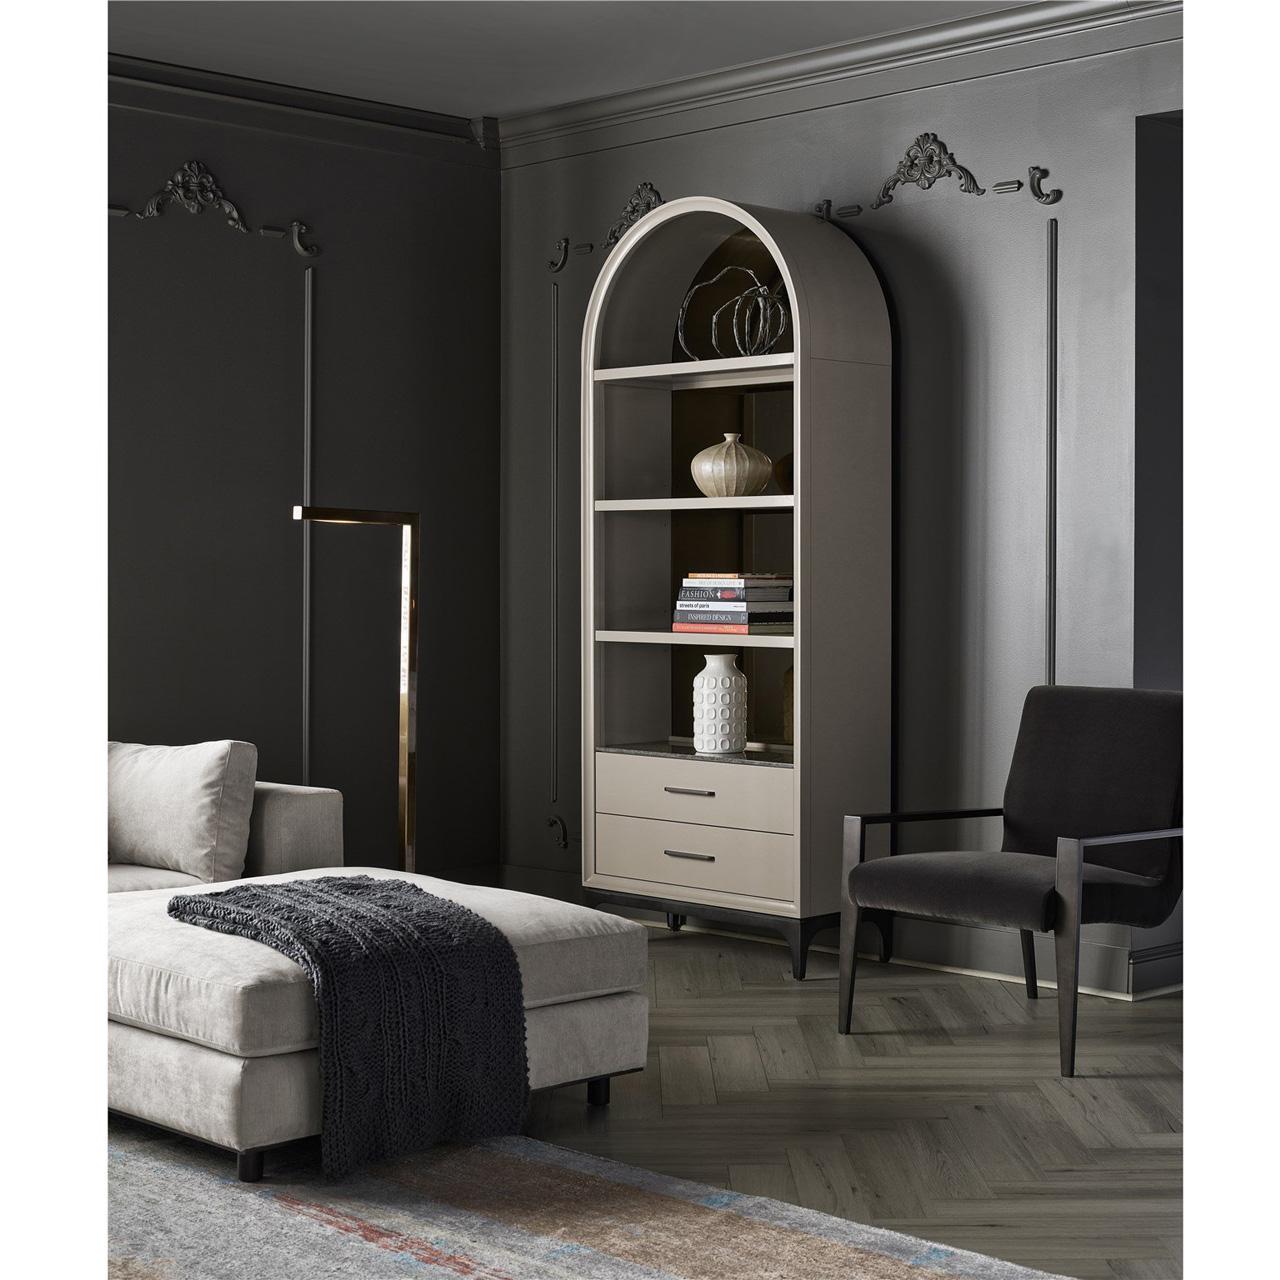 Amira Modern Classic White Wood Bronze Mirror Arch Display Bookshelf